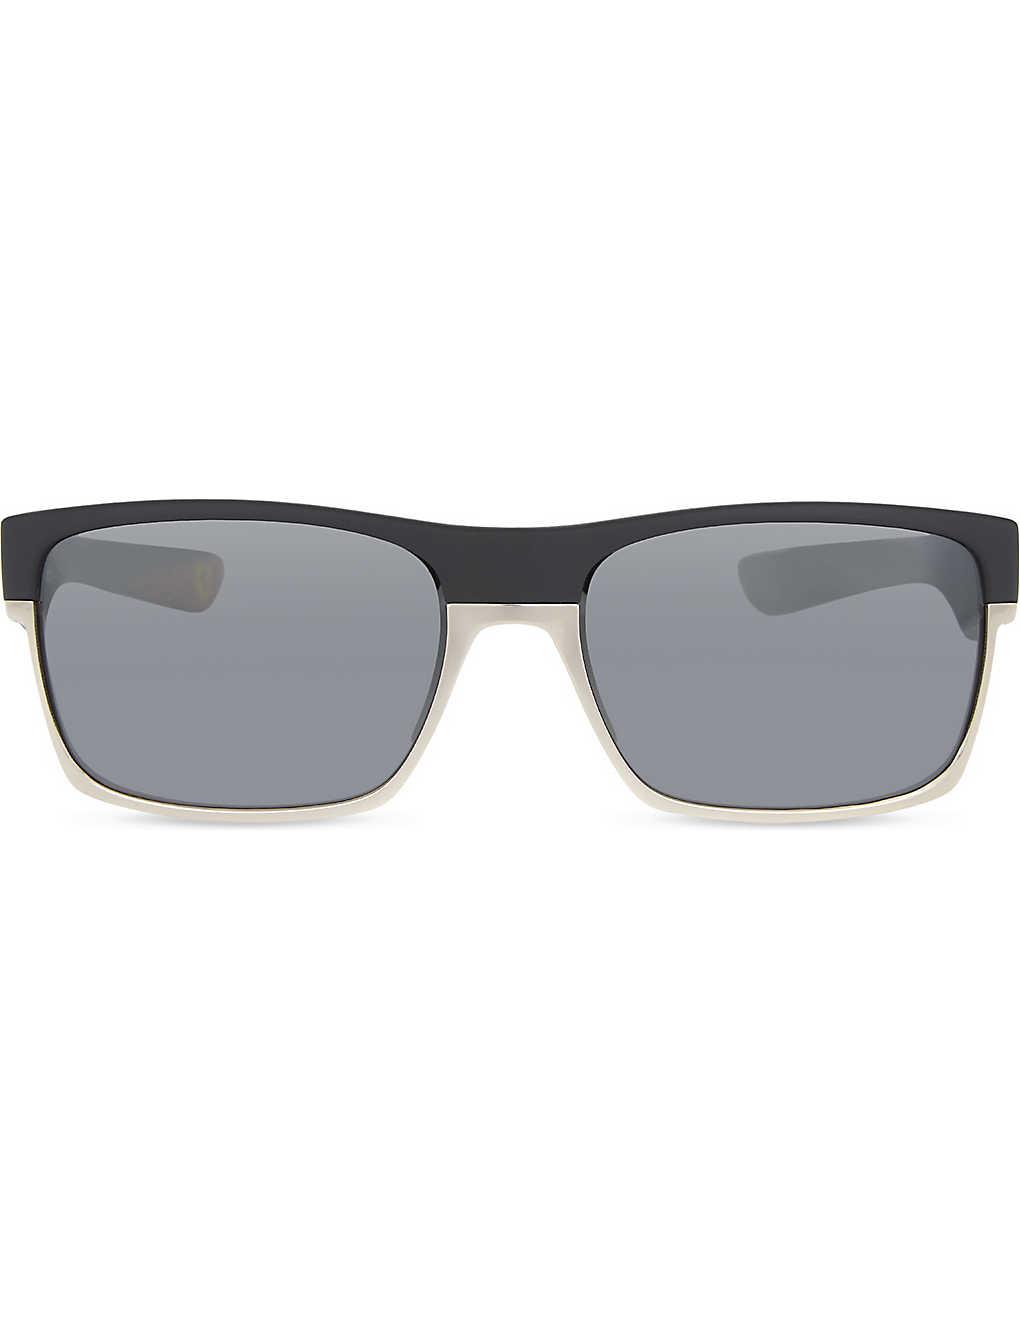 991e859f47 OAKLEY - Oo9189-20 scuderia ferrari® twoface square-frame sunglasses ...